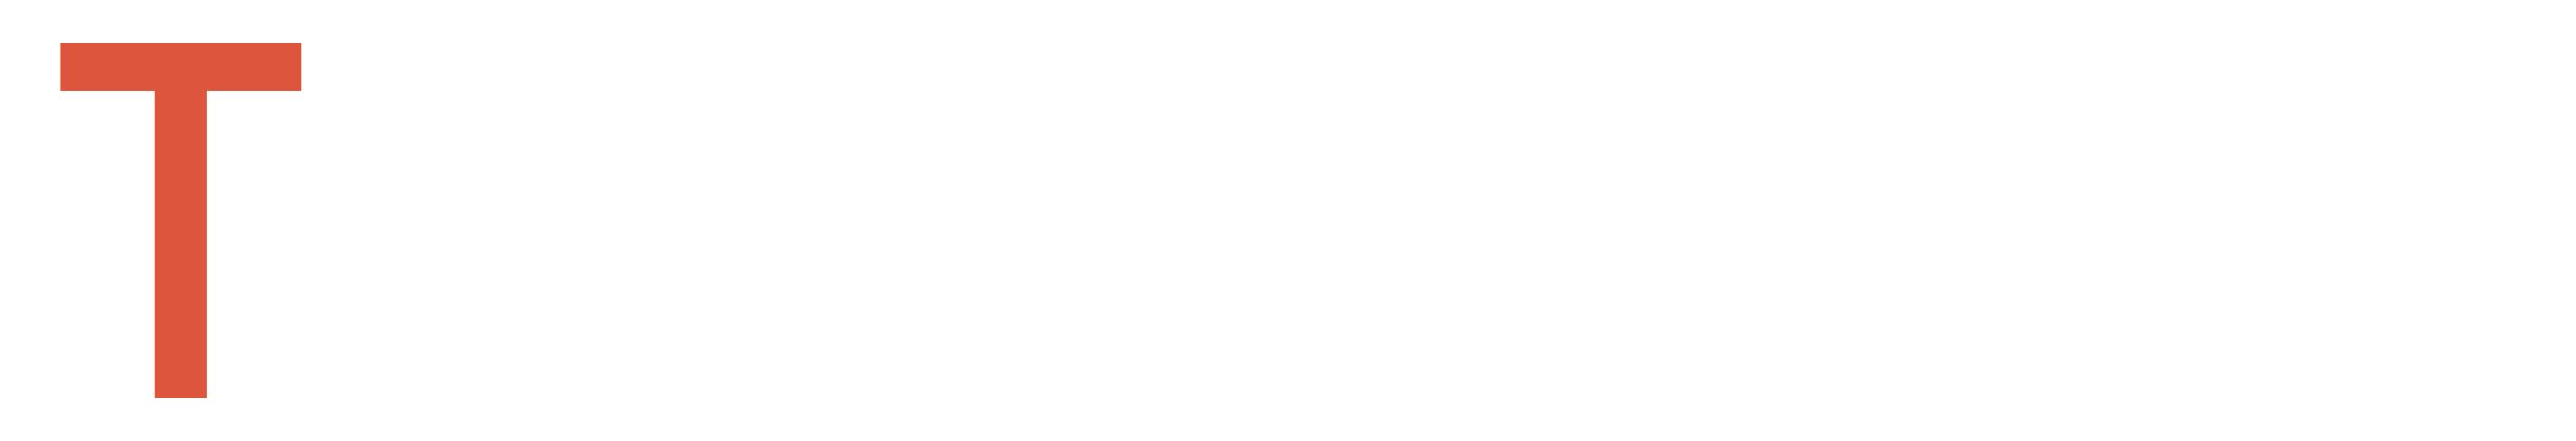 TOOL-PACK by Toolstatic Polska Antistatic Innovation